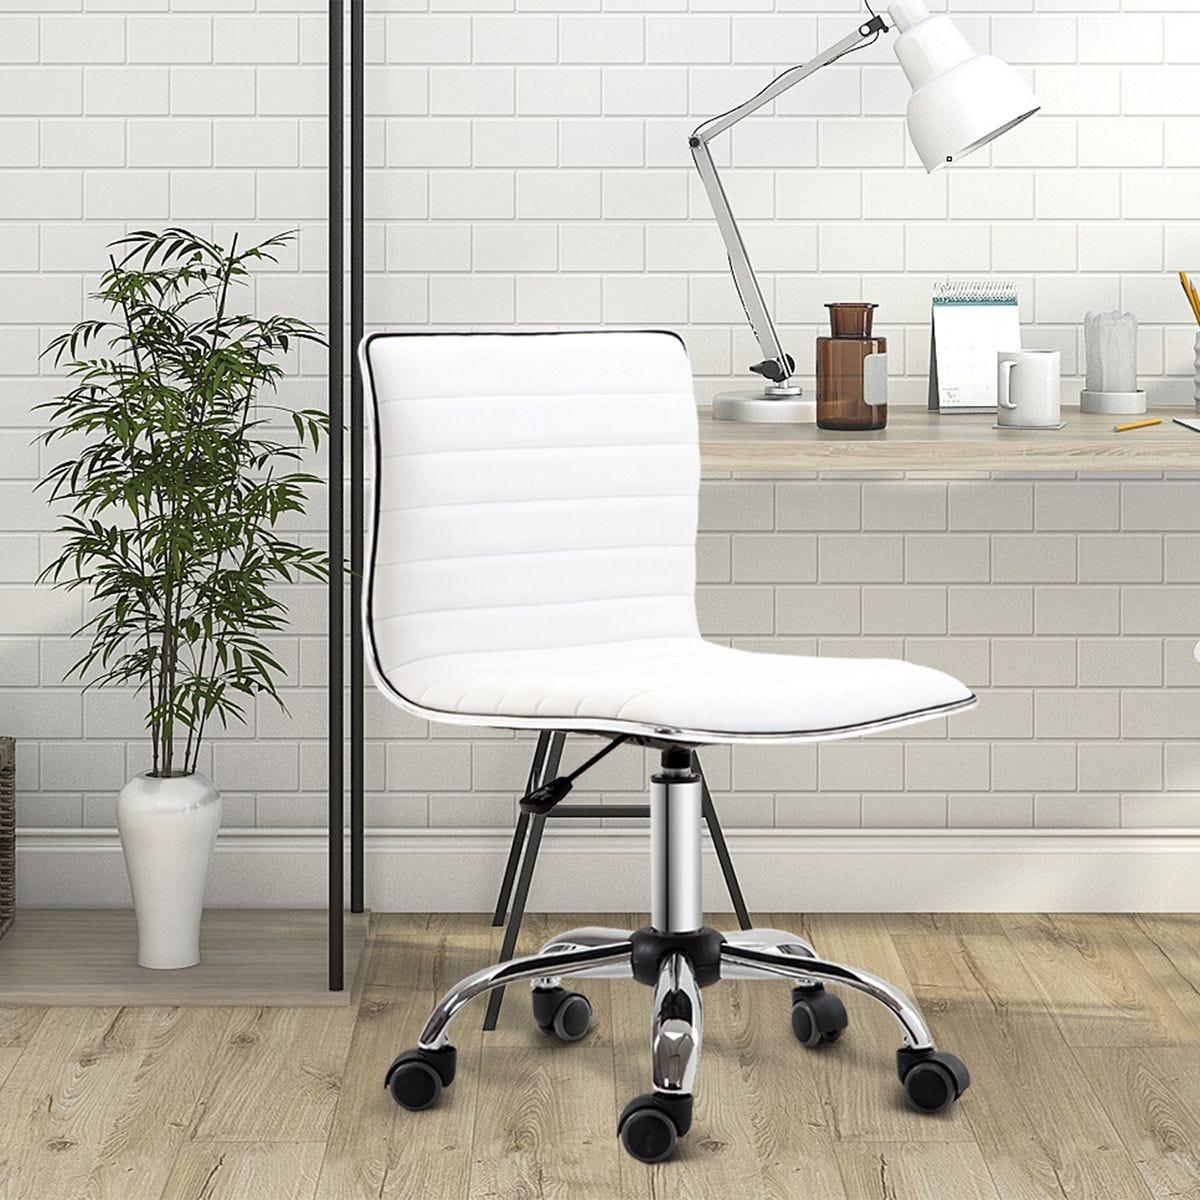 Ergonomic Executive Office Chair Computer Armless PU Wheels 360 Swivel White